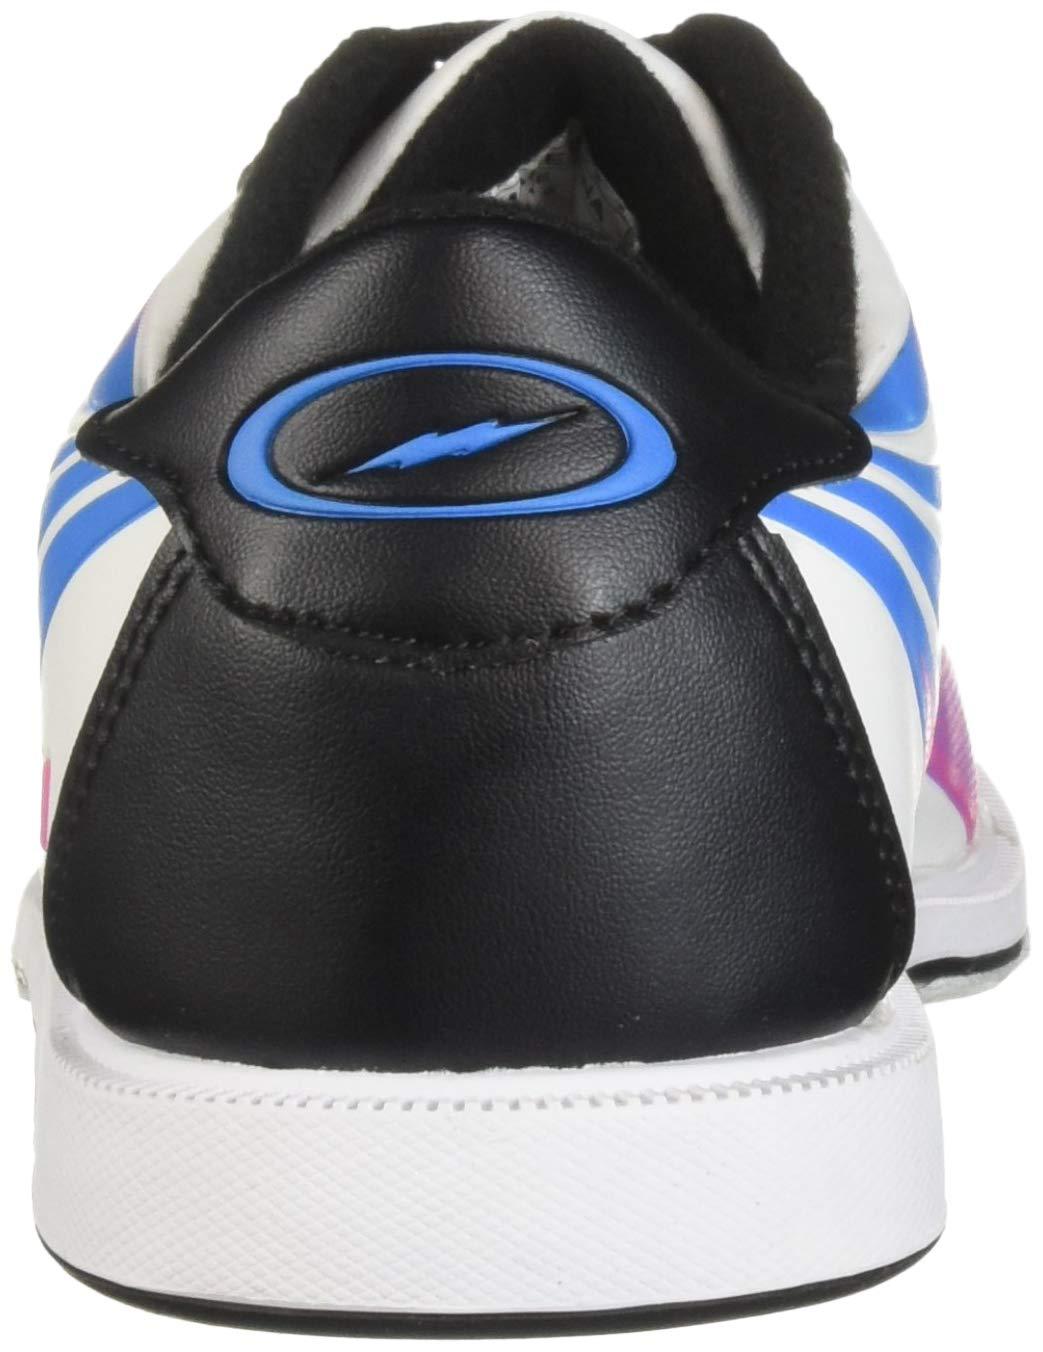 Storm Womens Skye Bowling Shoes White//Black//Multi Storm Bowling Shoes